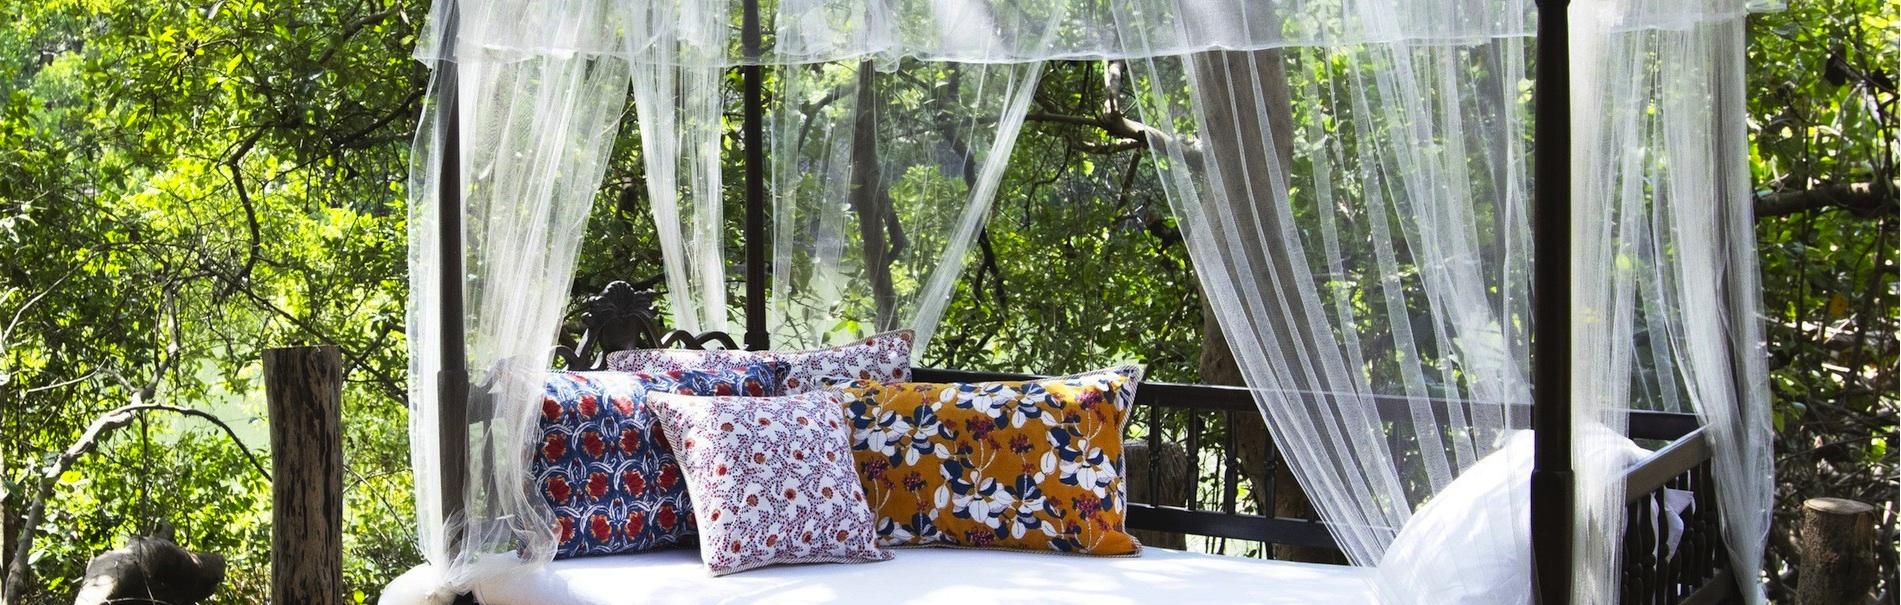 jamini cushion covers